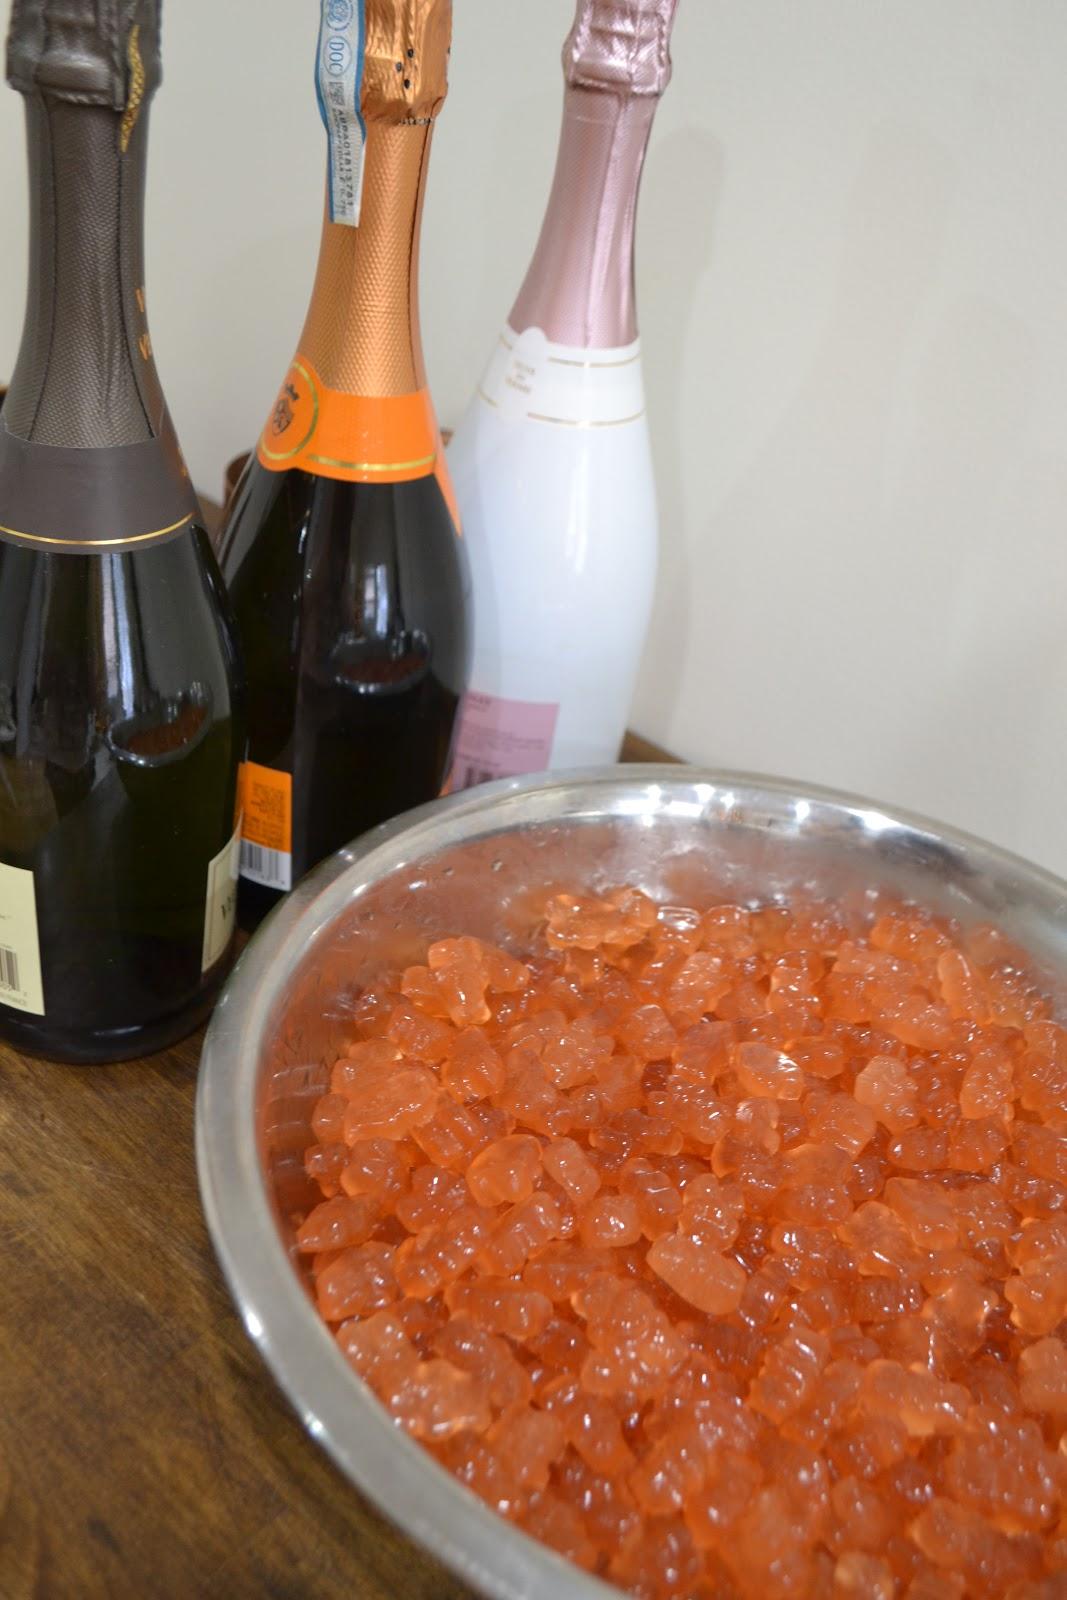 DIY champagne gummy bears